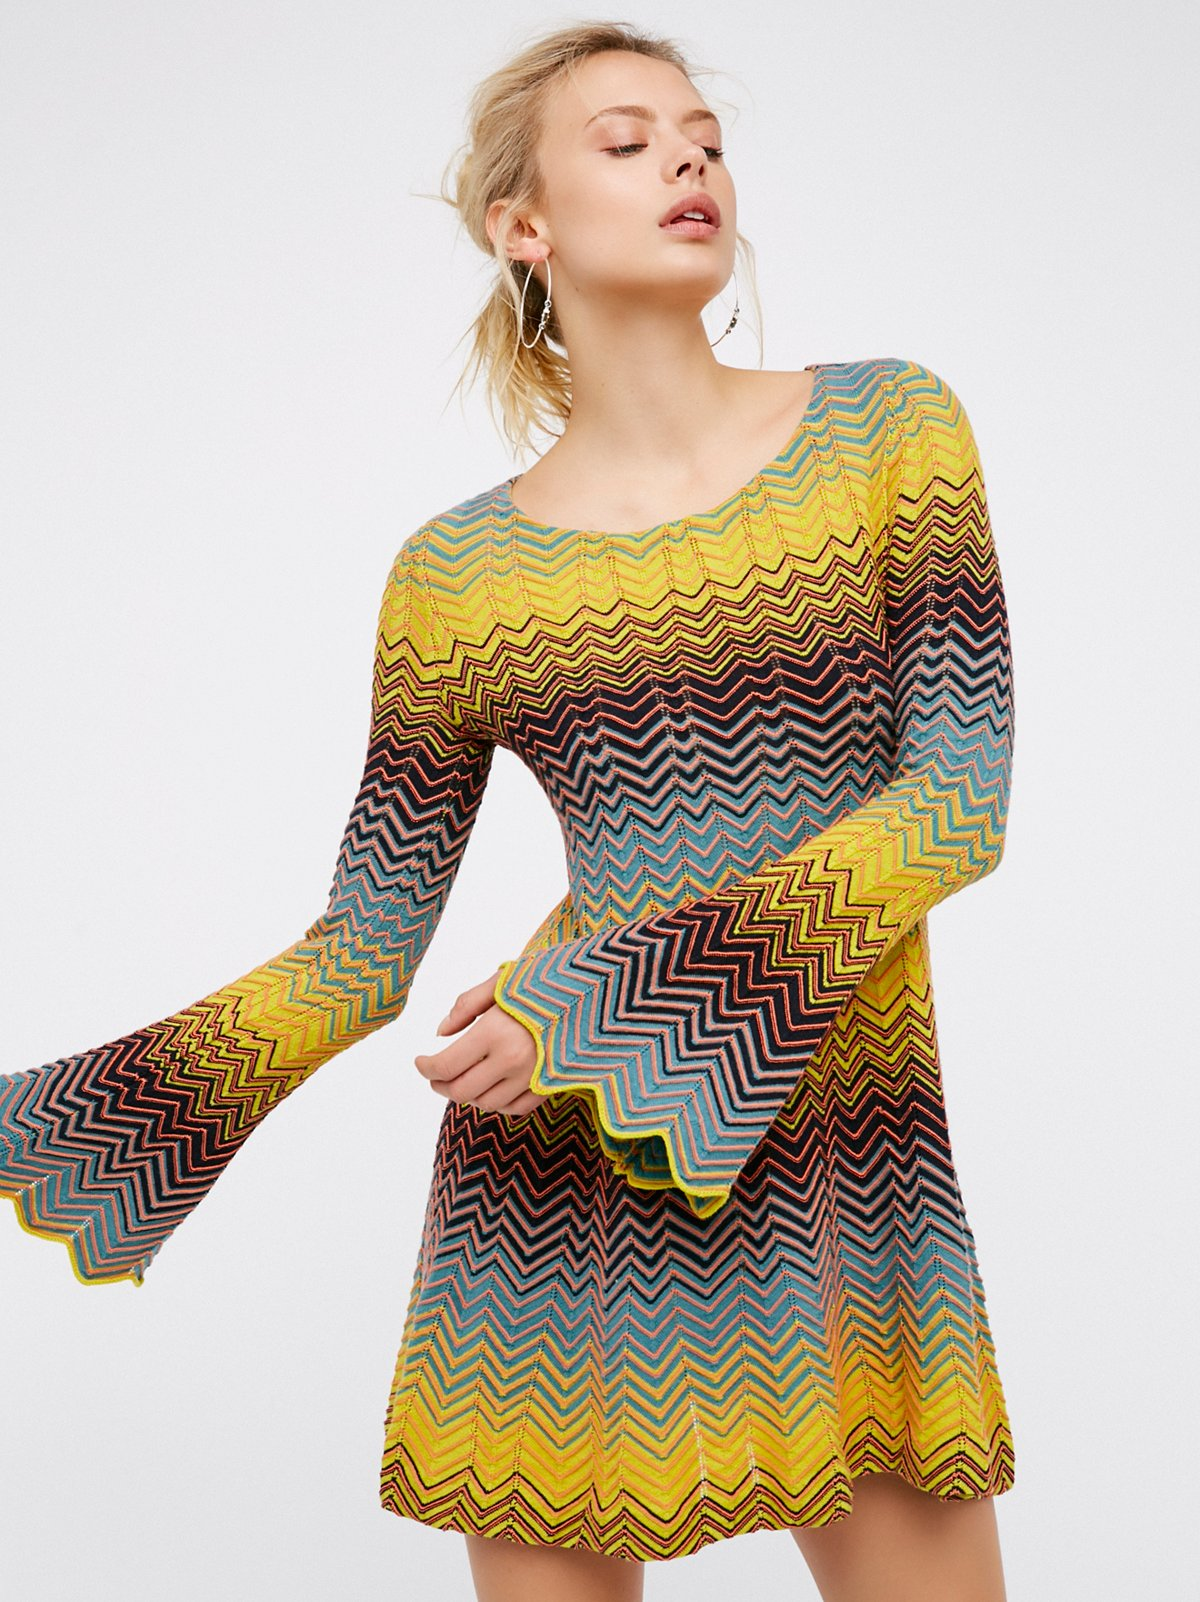 Bella Sweater迷你连衣裙